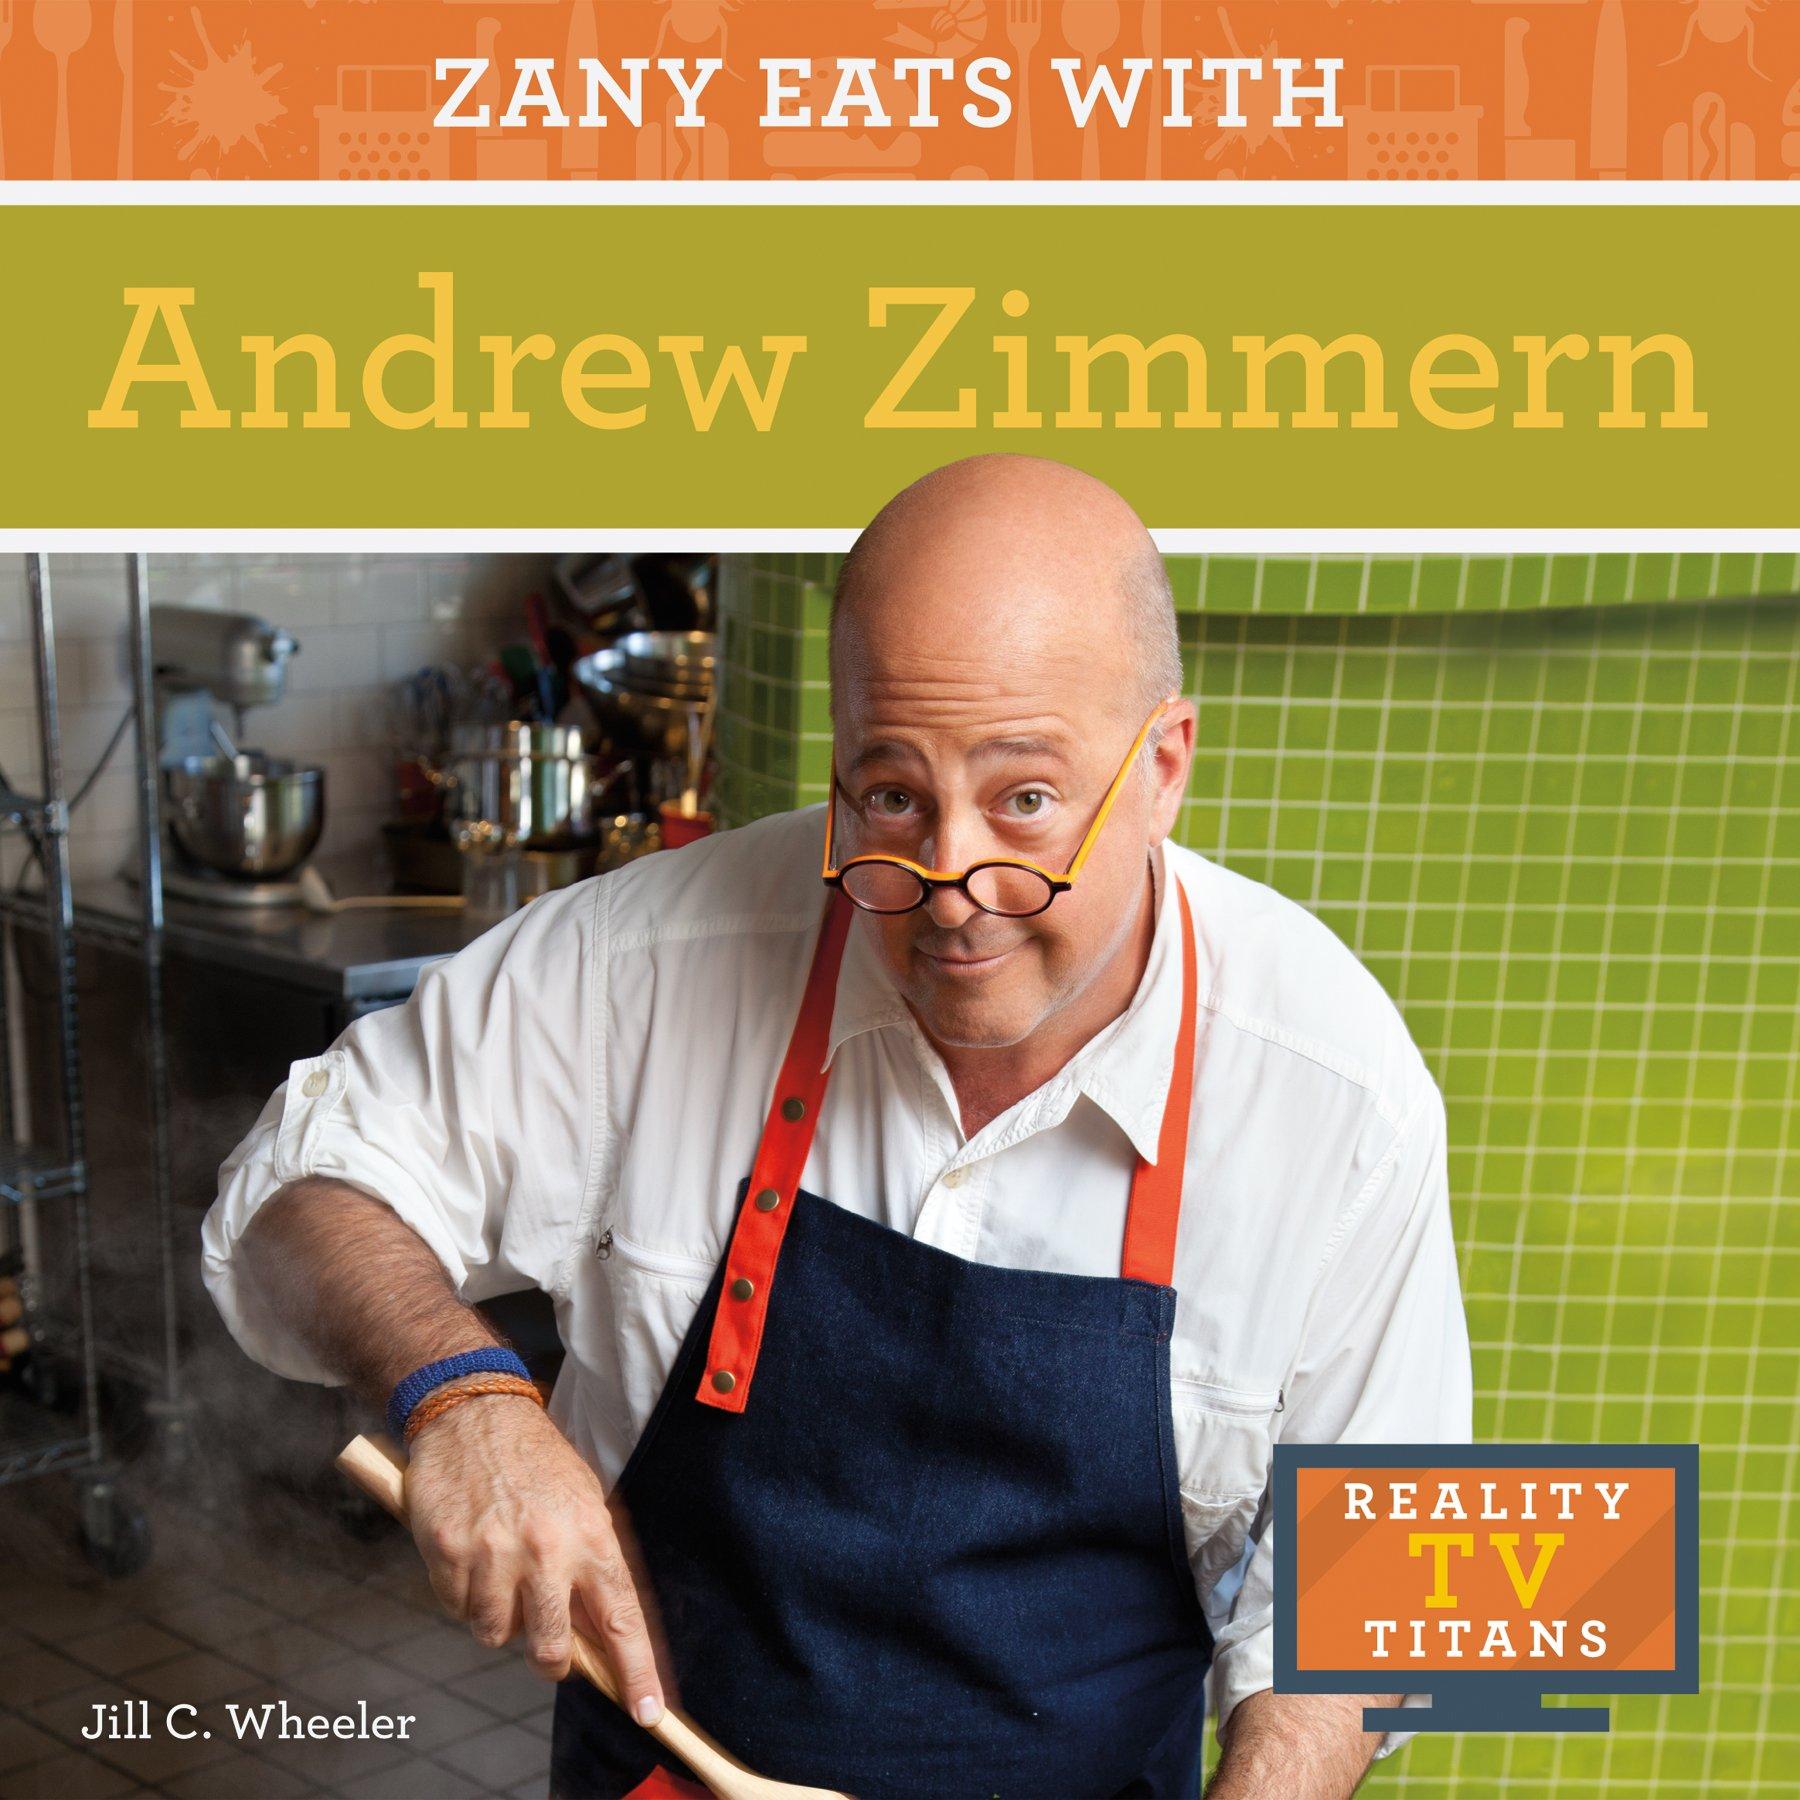 Zany Eats With Andrew Zimmern (Reality TV Titans)